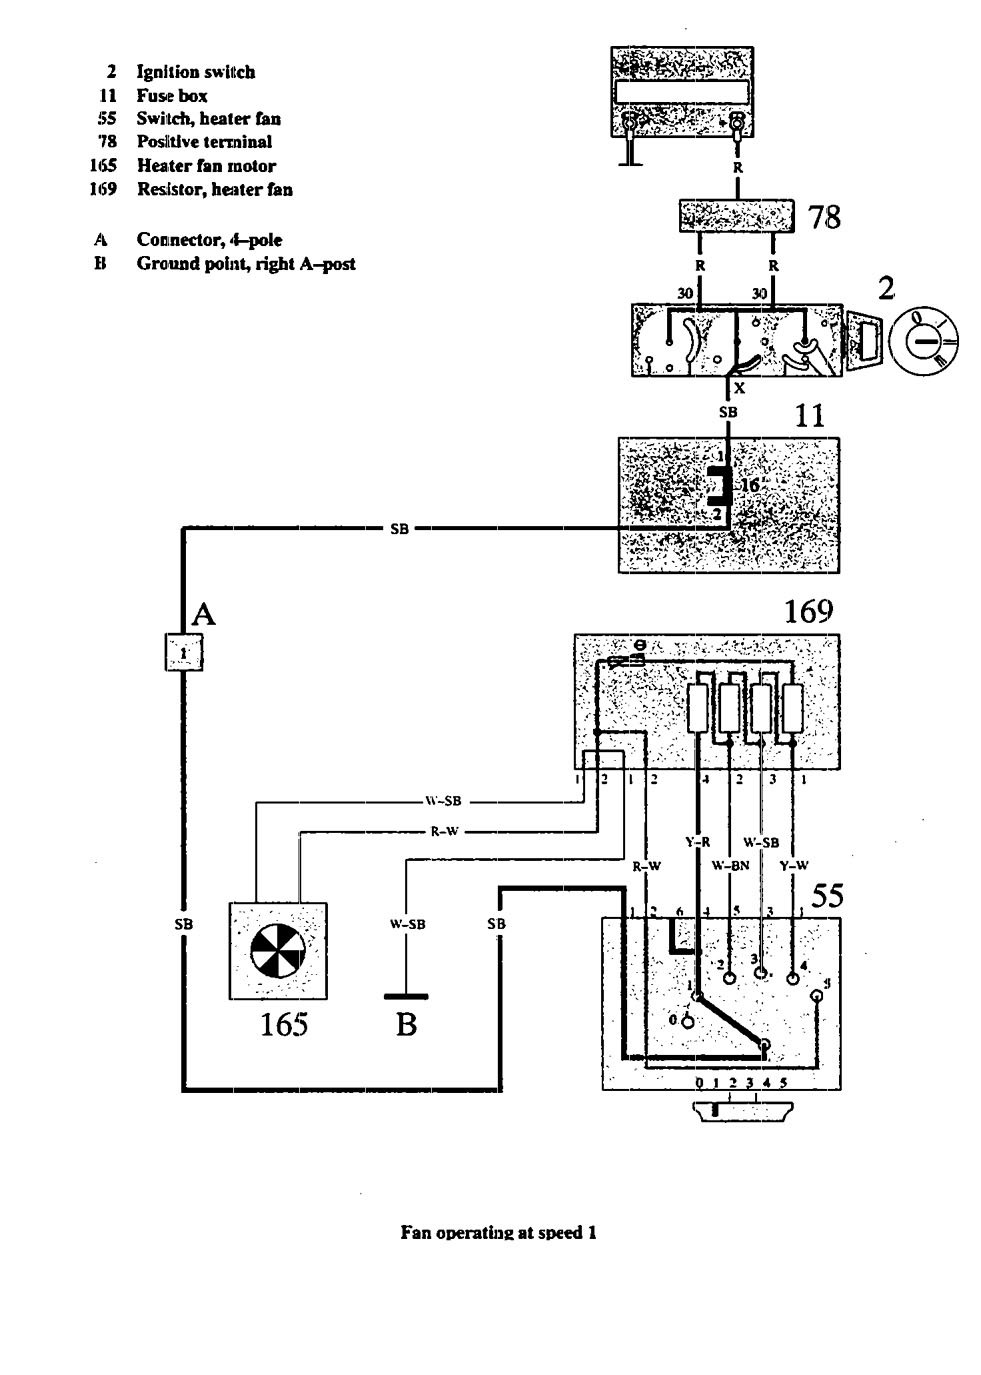 medium resolution of saab heater wiring diagram 1991 saab auto parts catalog saab 9 3 stereo wiring diagram saab wiring harness